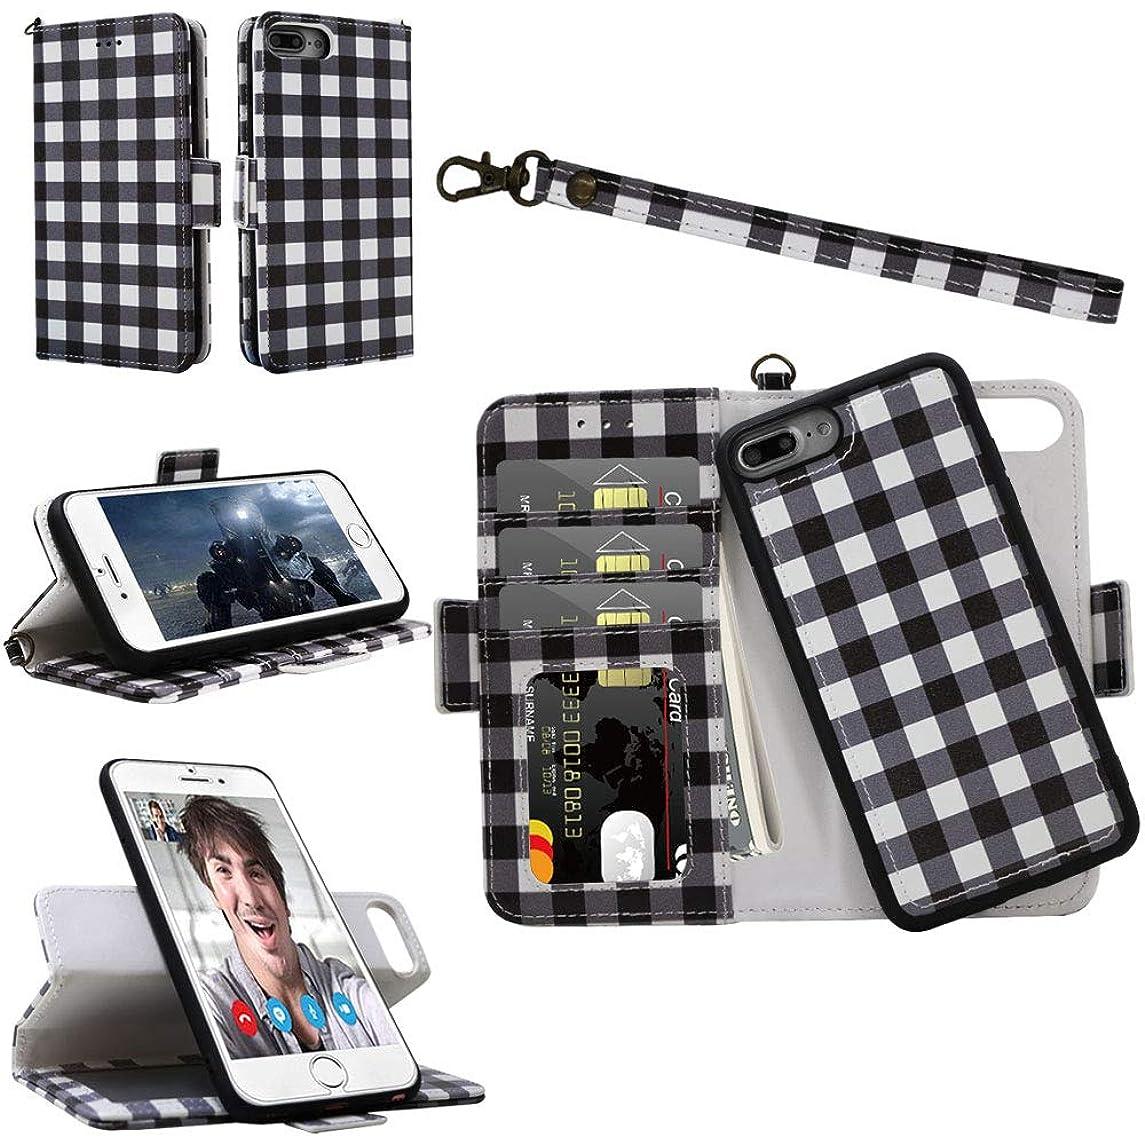 iPhone 8 Plus / 7 Plus / 6S Plus / 6 Plus Wallet Detachable Case with Wrist Strap, Magnetic Closure - Samgg Flip Folio Leather Cases with Tempered Glass for Apple iPhone 8/7/6S/6 Plus (Lattice #3)